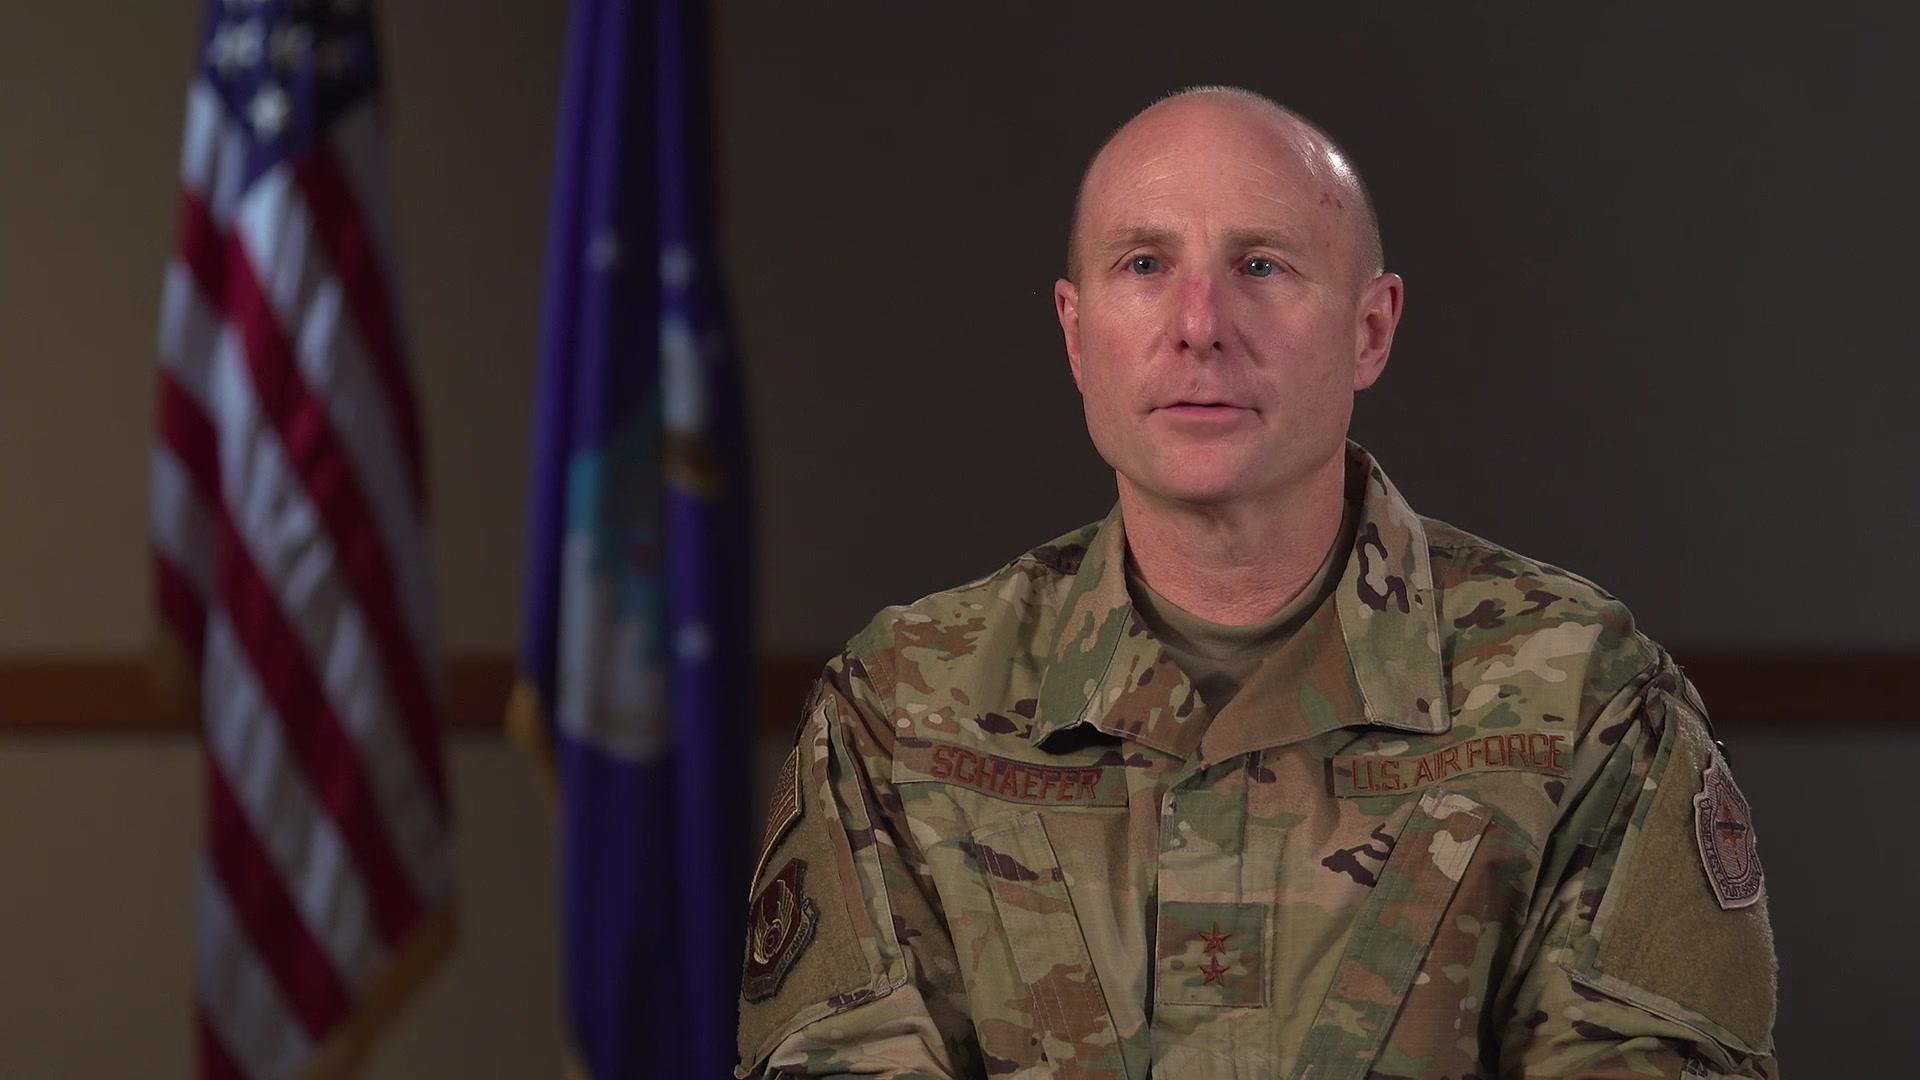 Maj. Gen. Carl Schaefer, Deputy Commander, Air Force Materiel Command, Wright-Patterson Air Force Base, Ohio